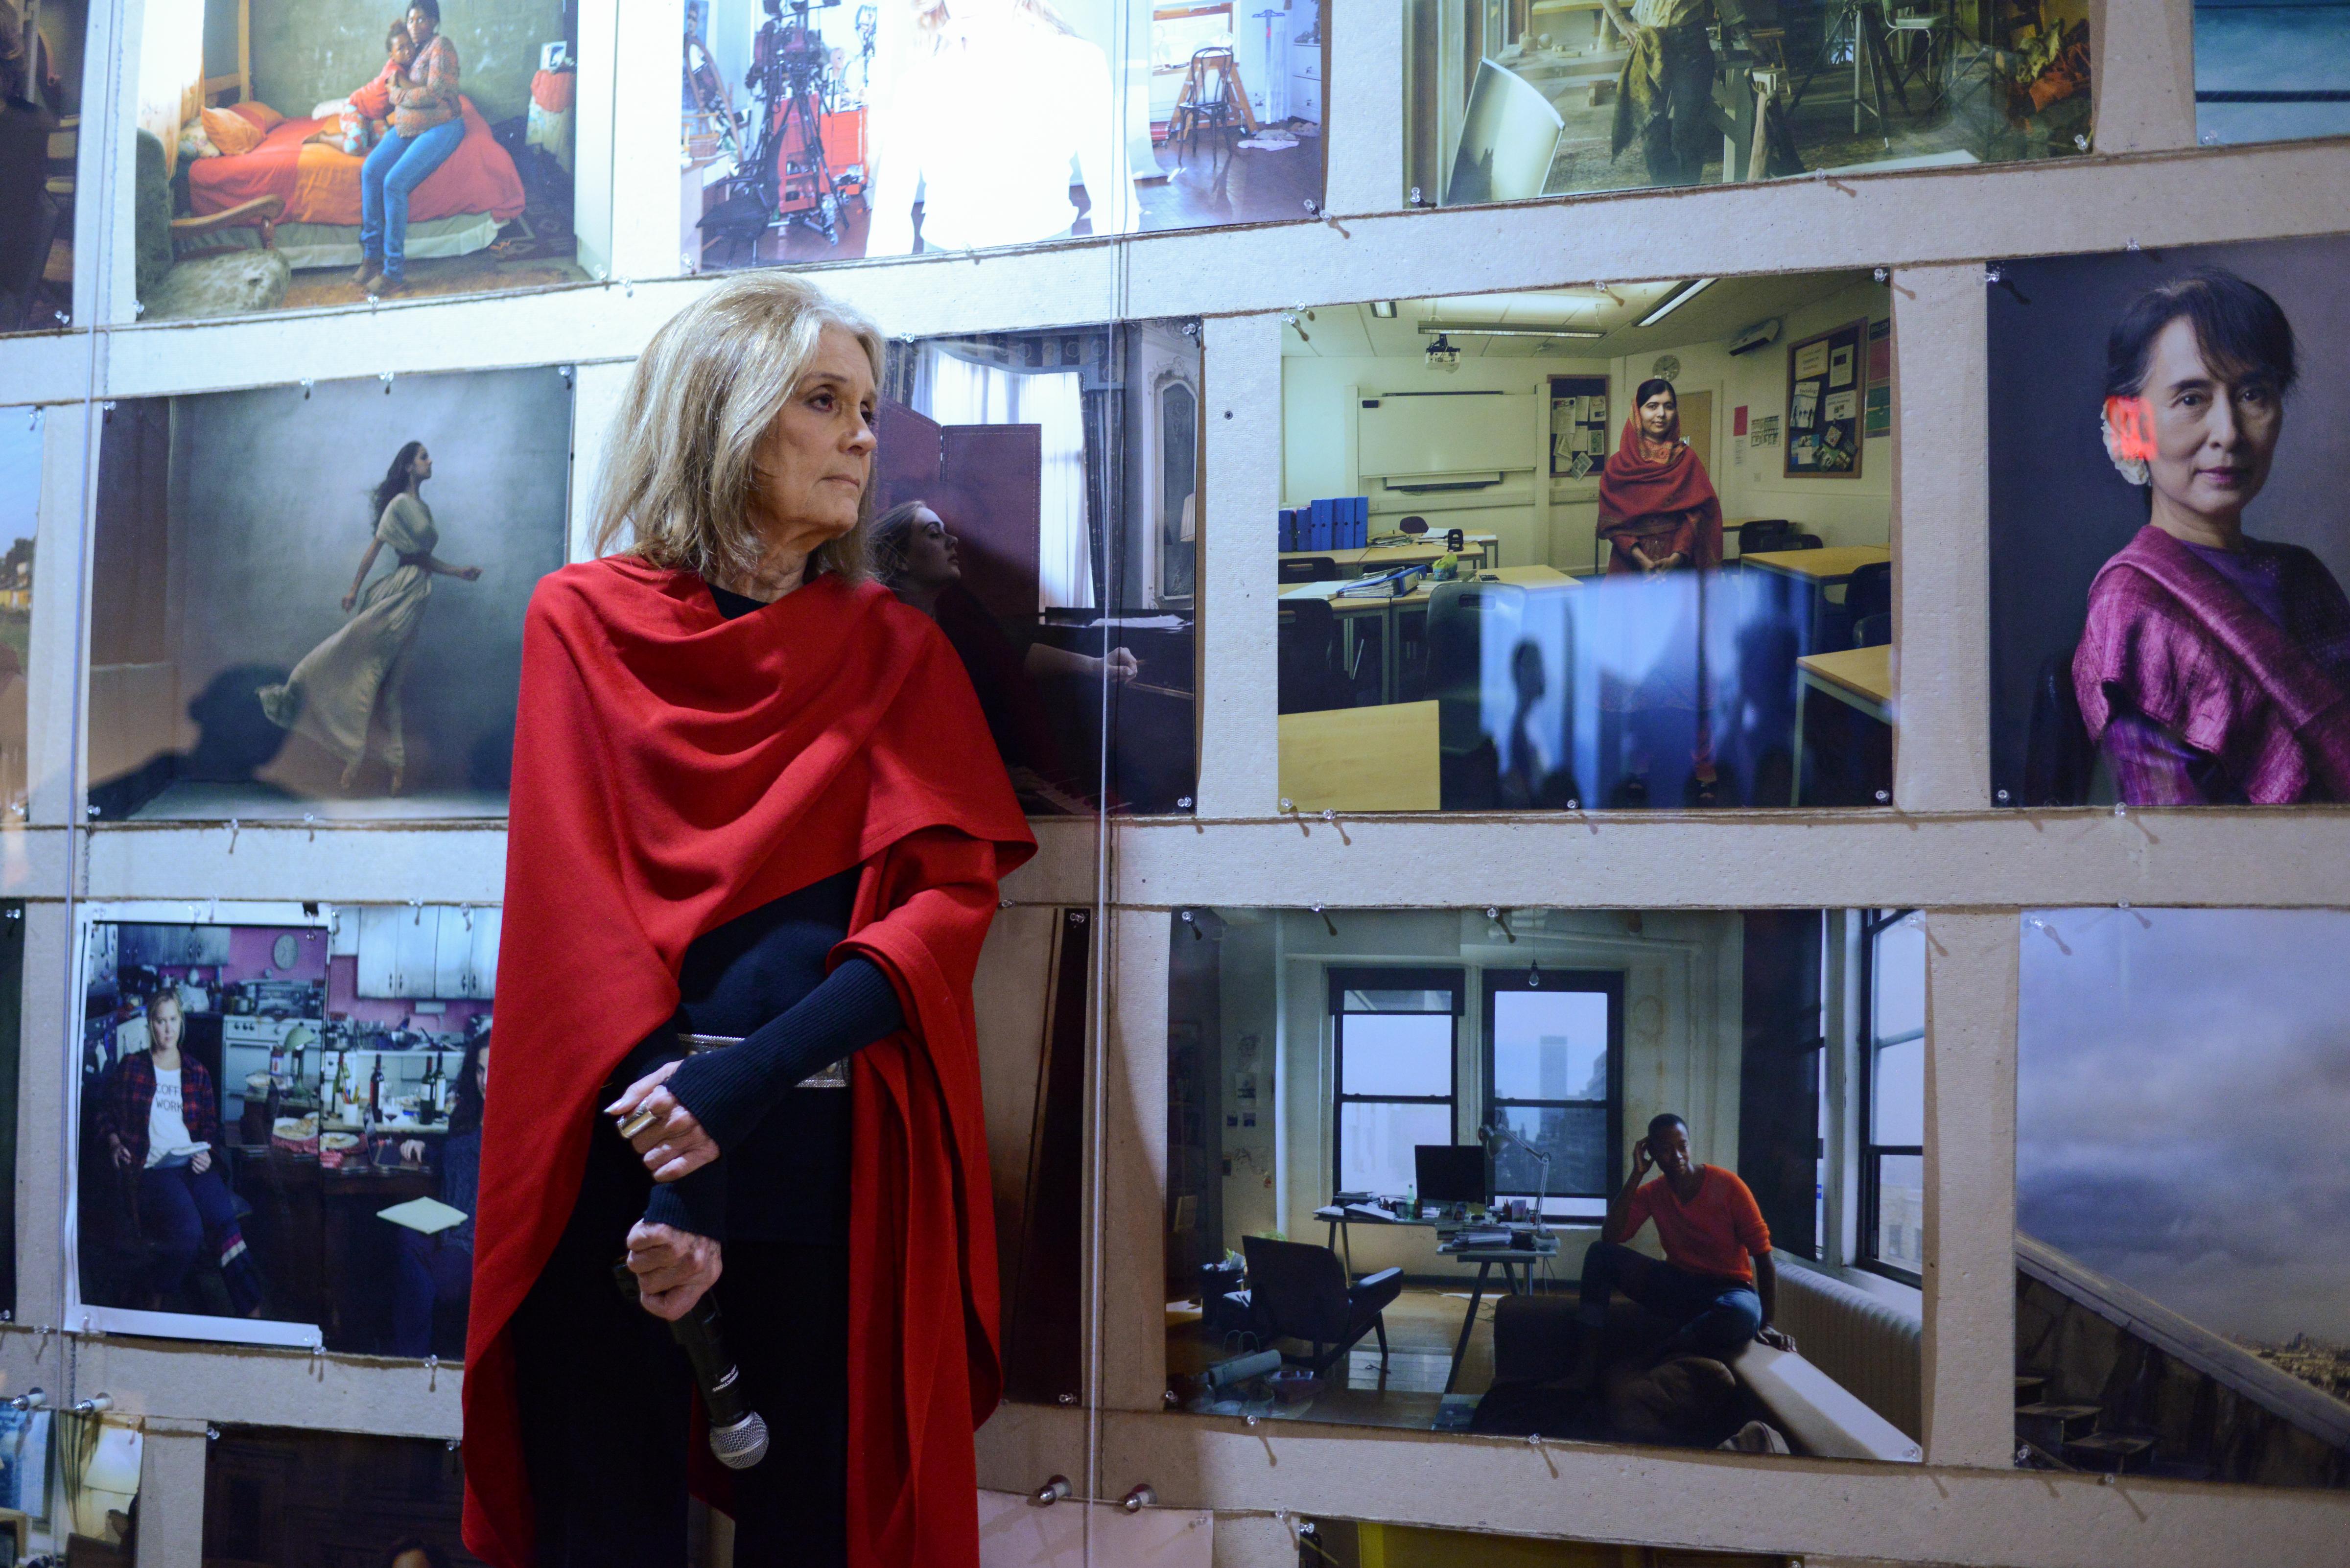 WOMEN-New Portraits-Annie Leibowitz-Press Preview